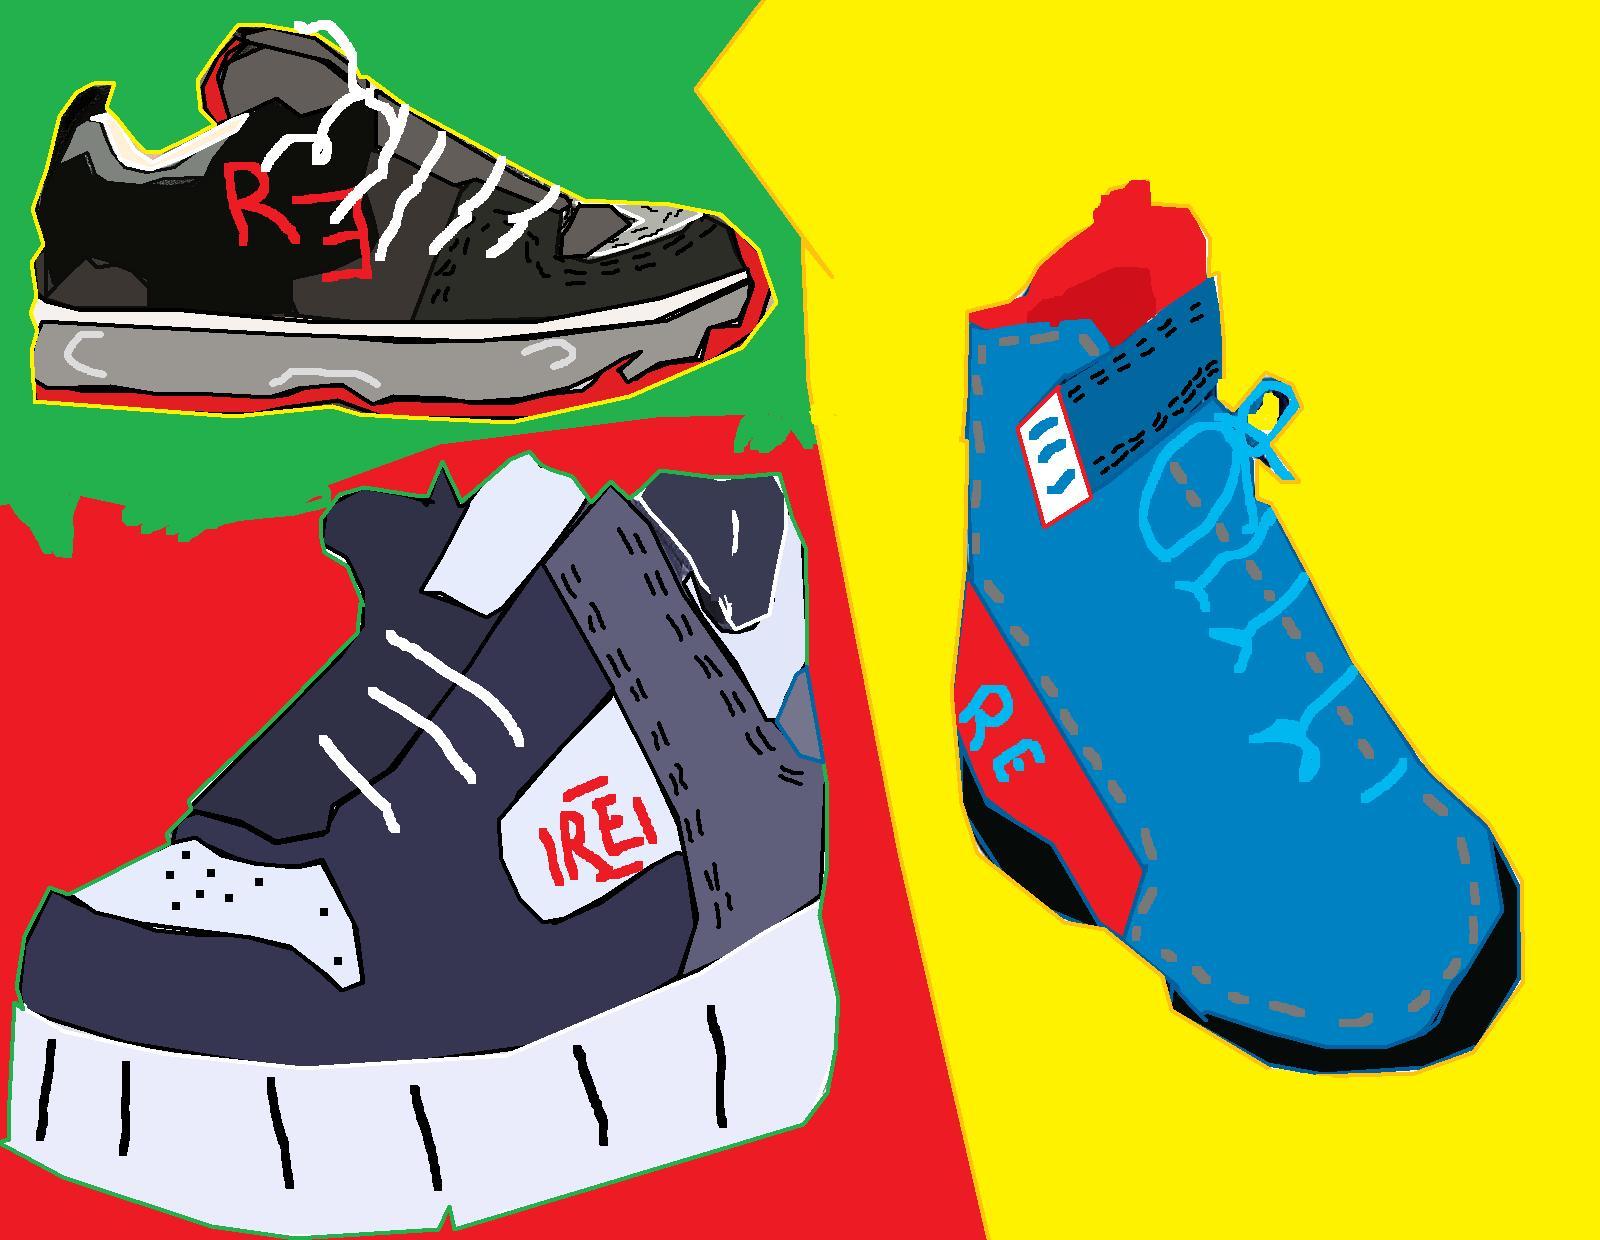 Redeyes shoes set 1